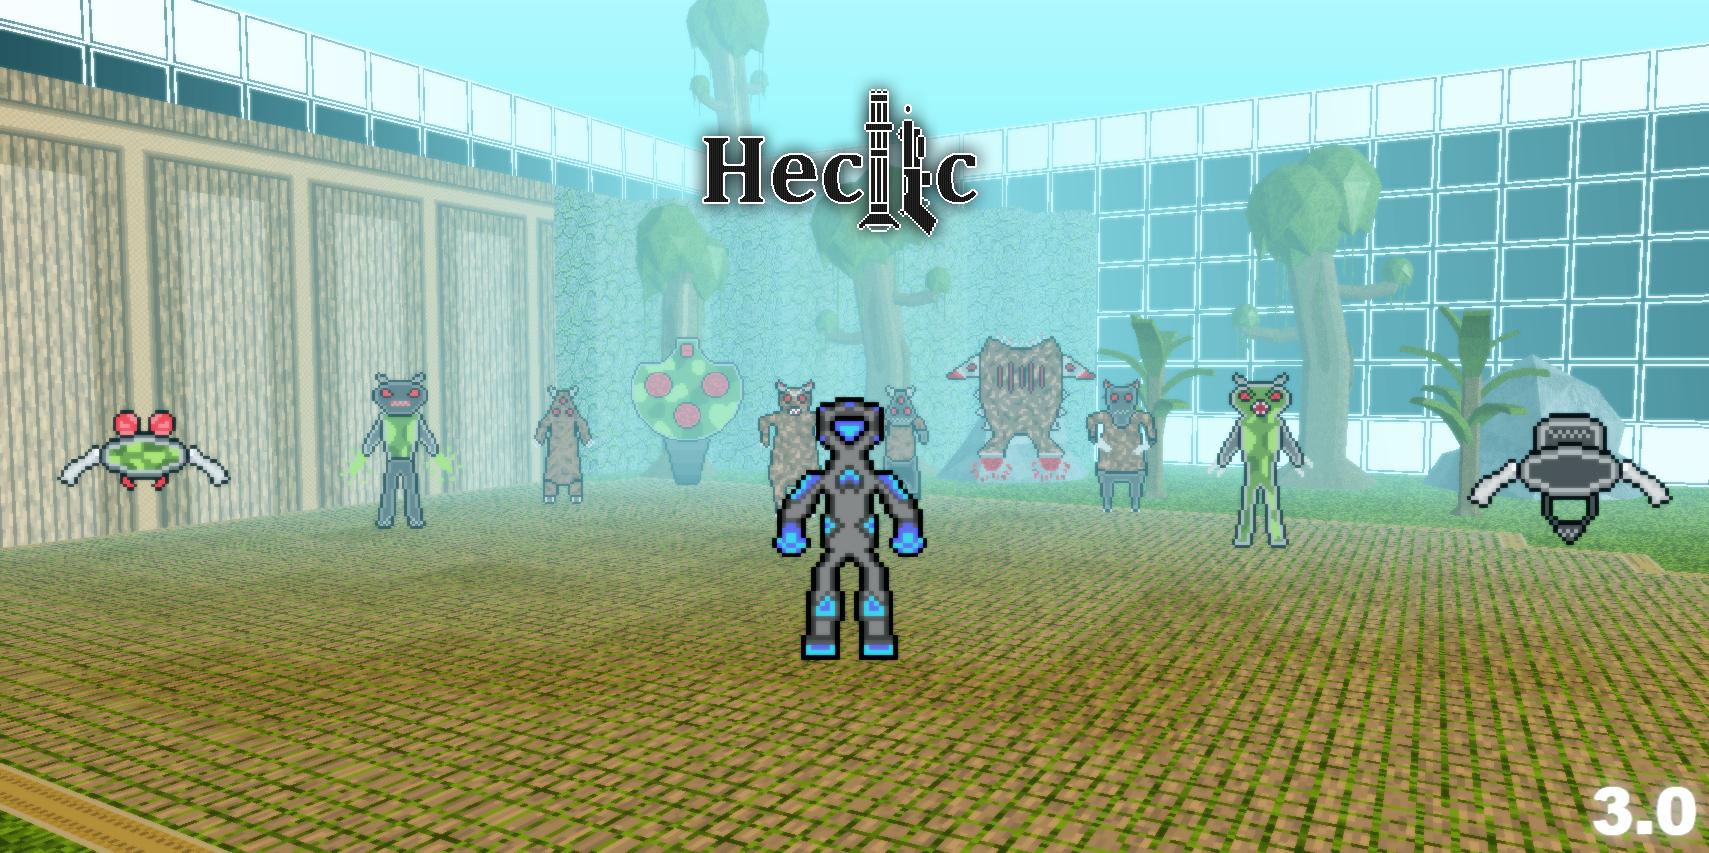 ht3 0